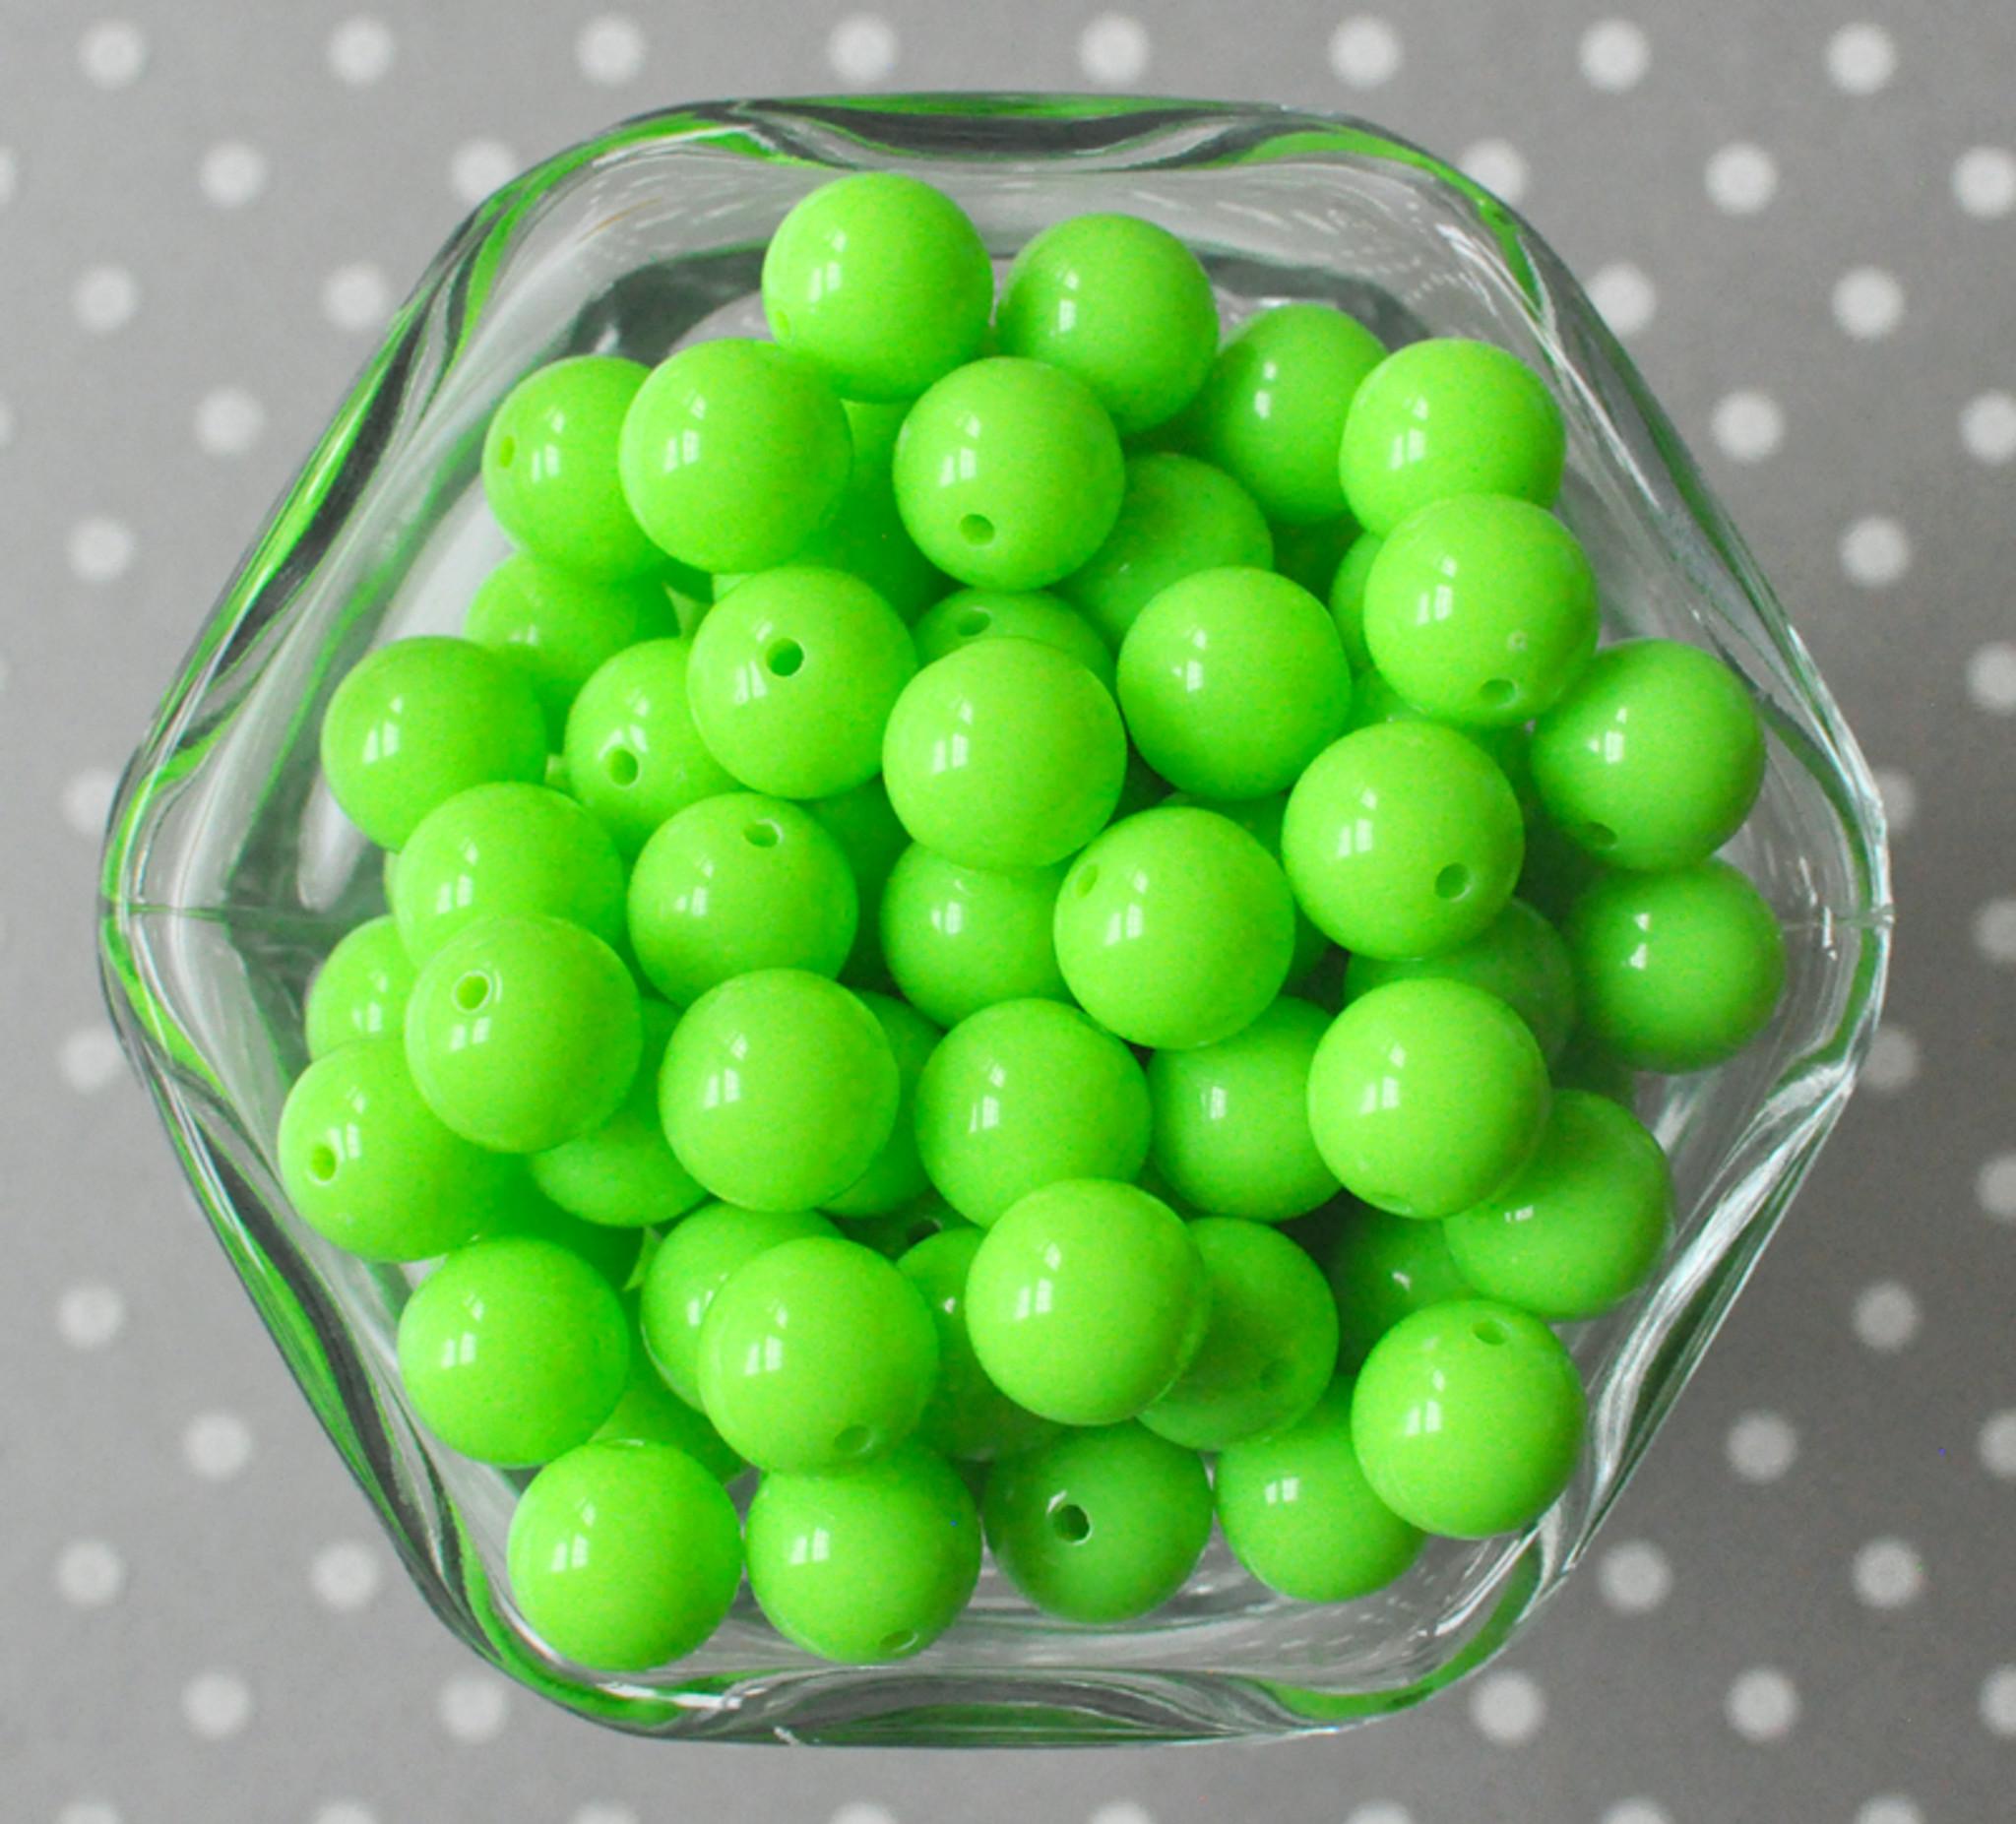 12mm Neon green solid small bubblegum beads in bulk